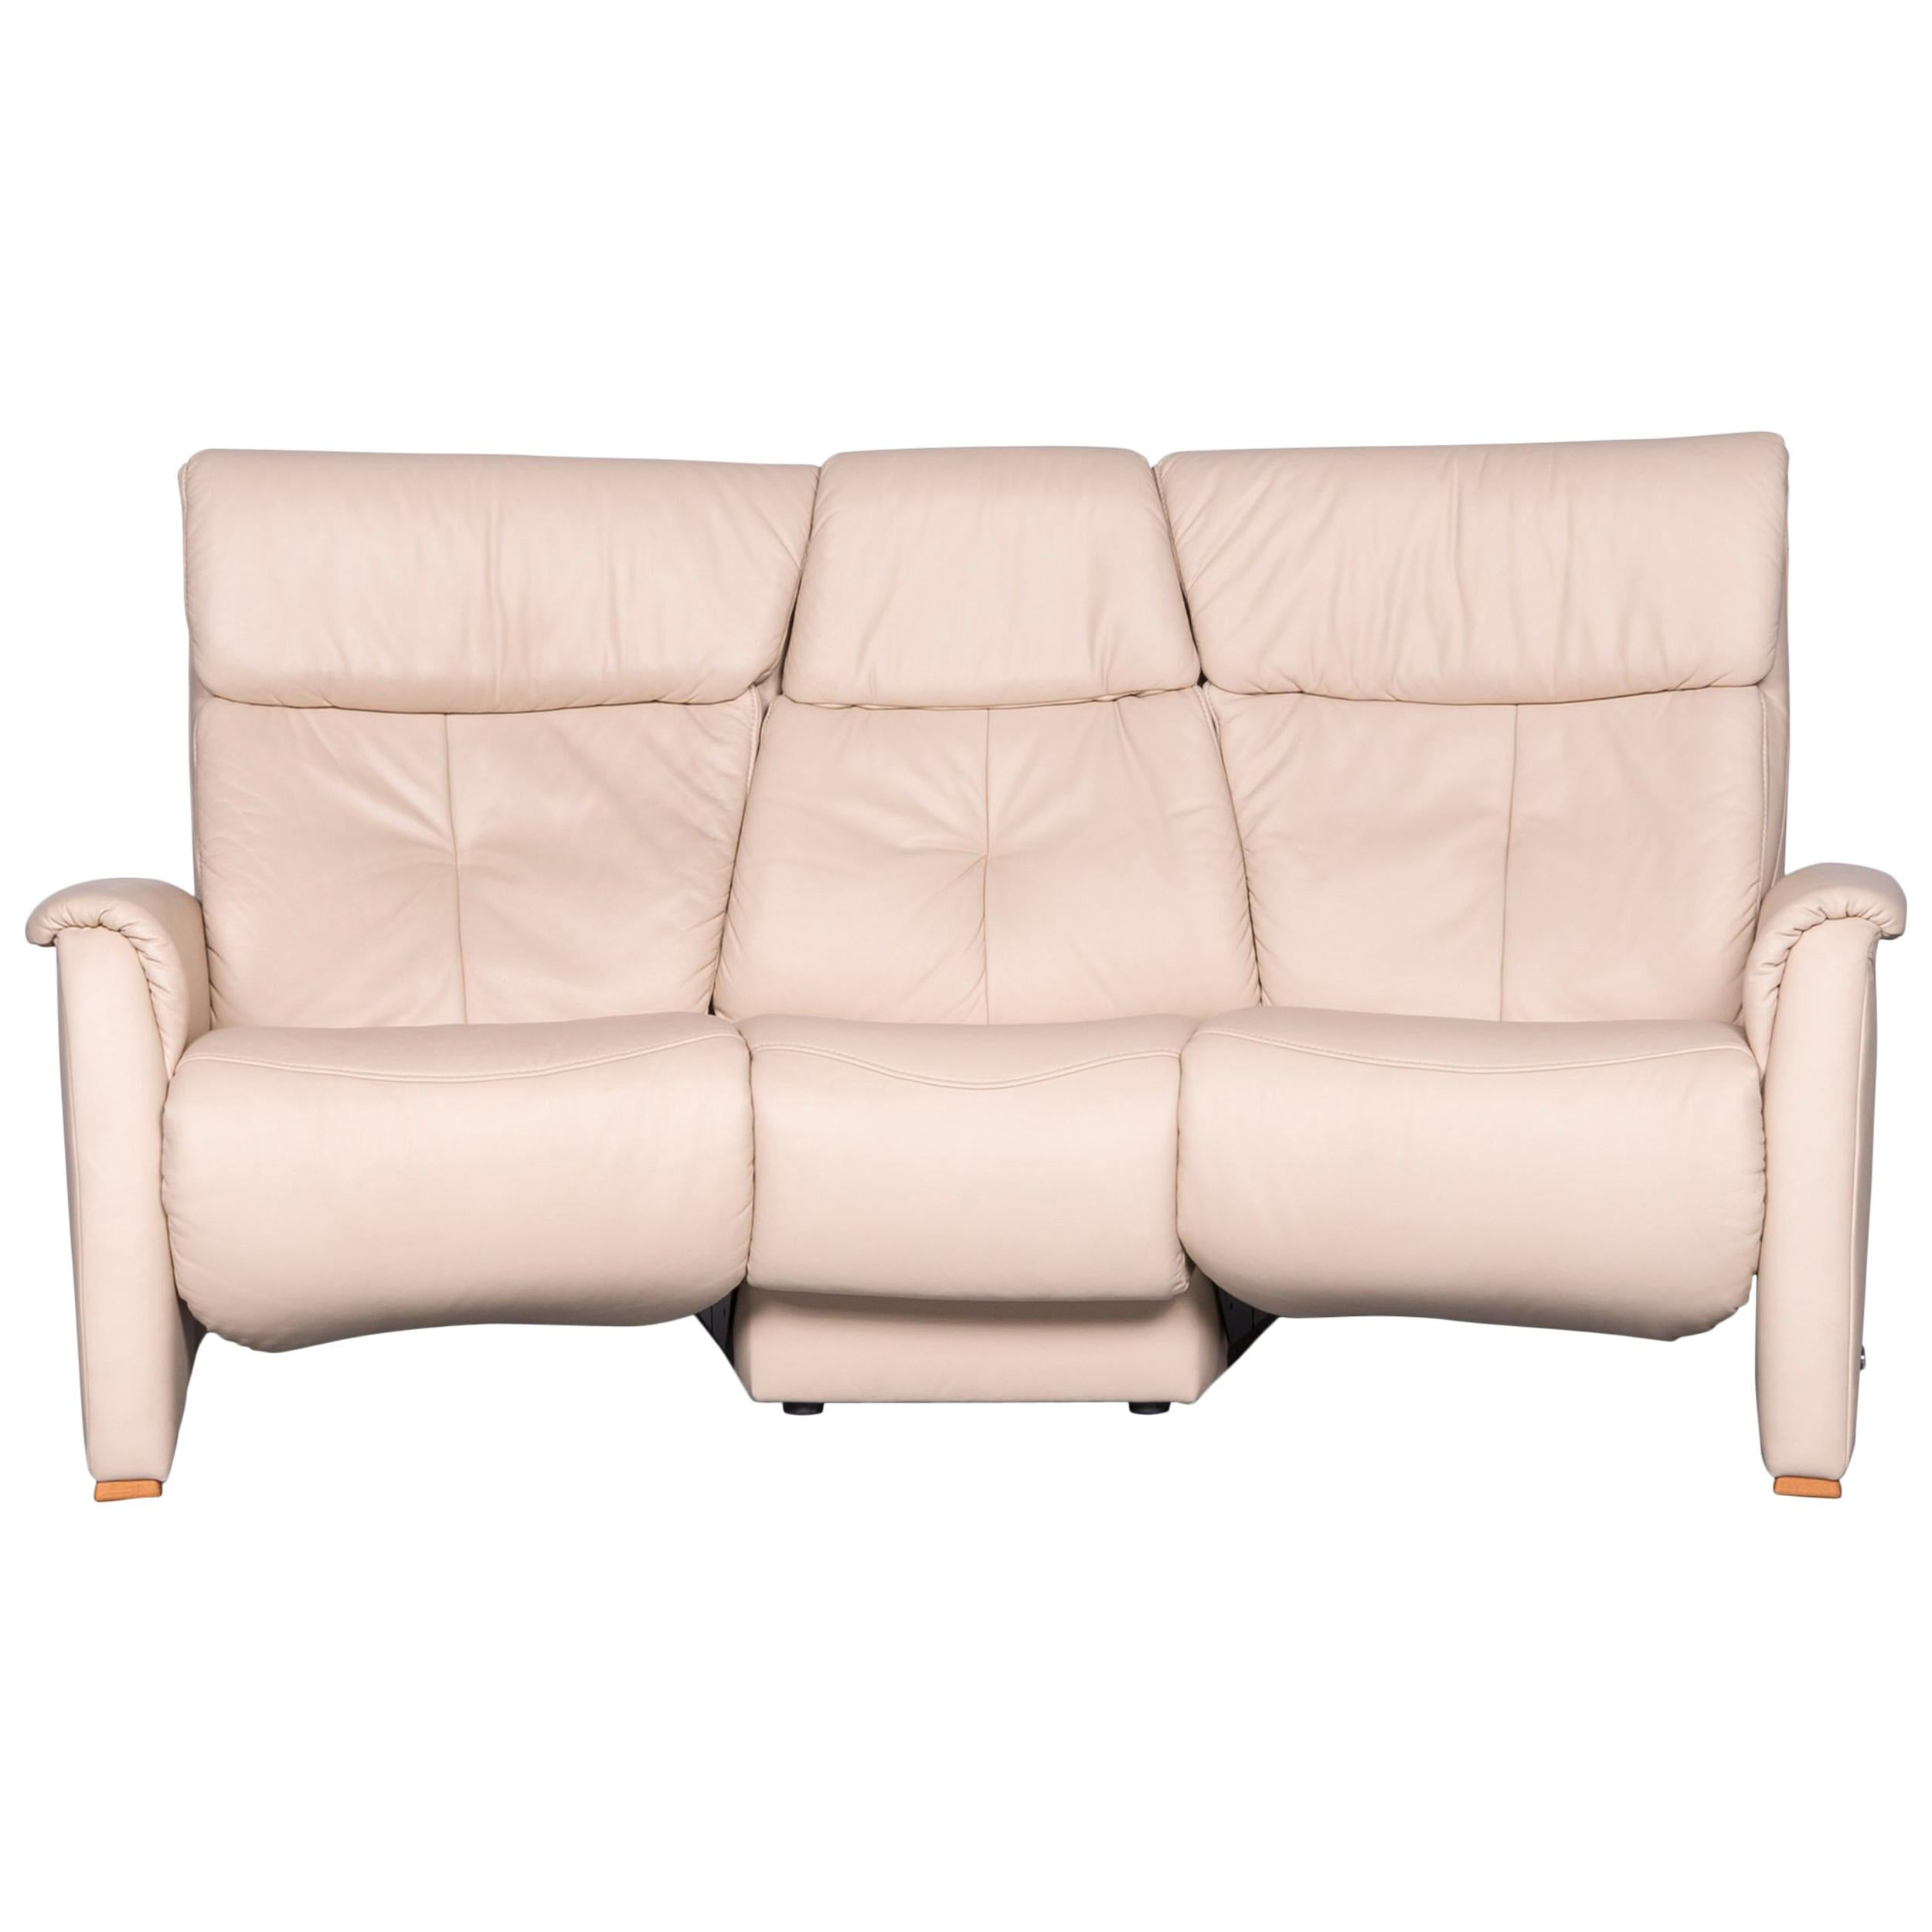 himolla trapez sofa off-white three-seat couch recliner XT3R4JPB